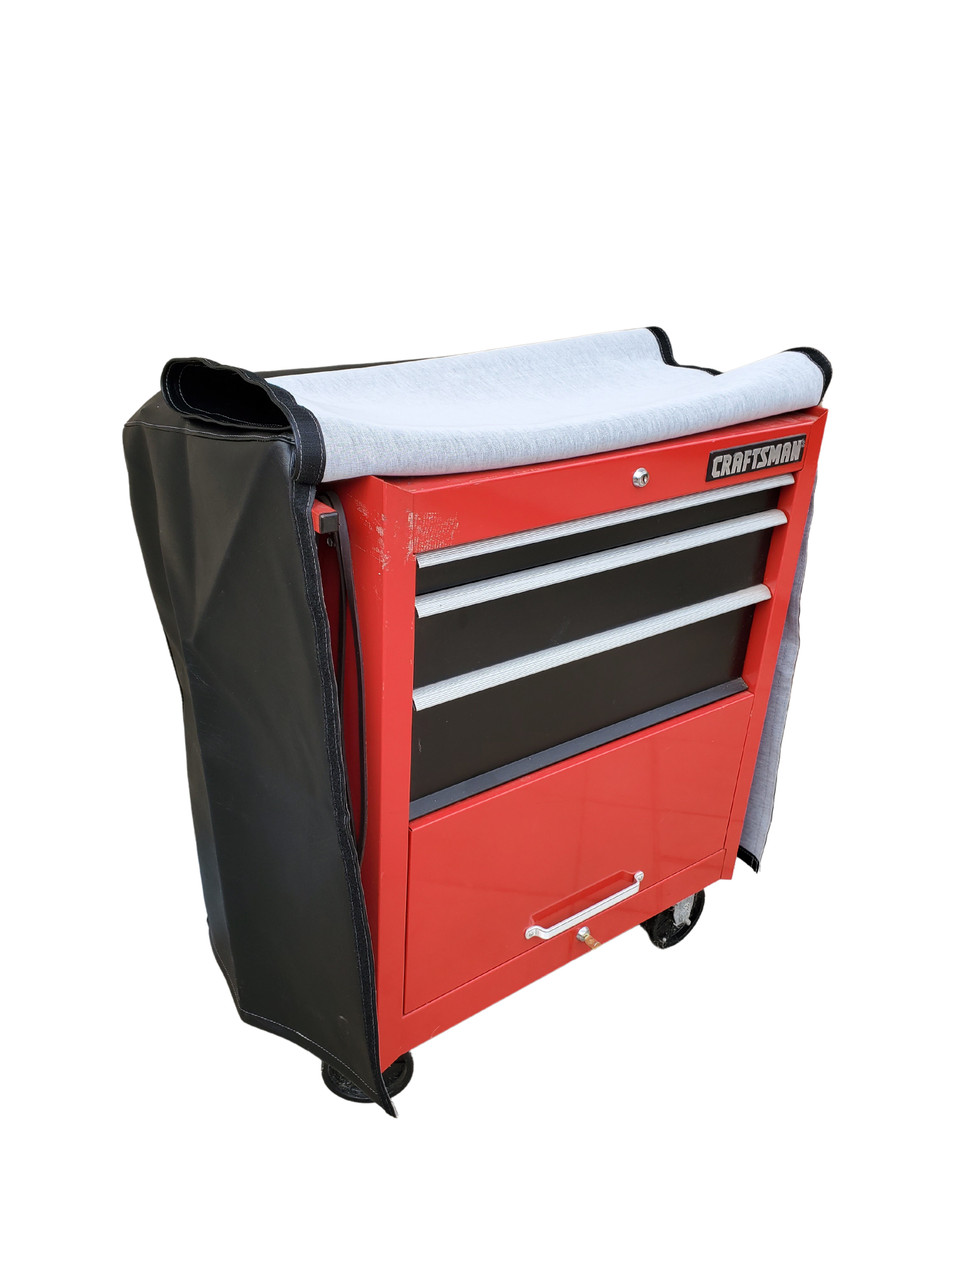 Armadillo Winterlux custom tool box cover velcro opening